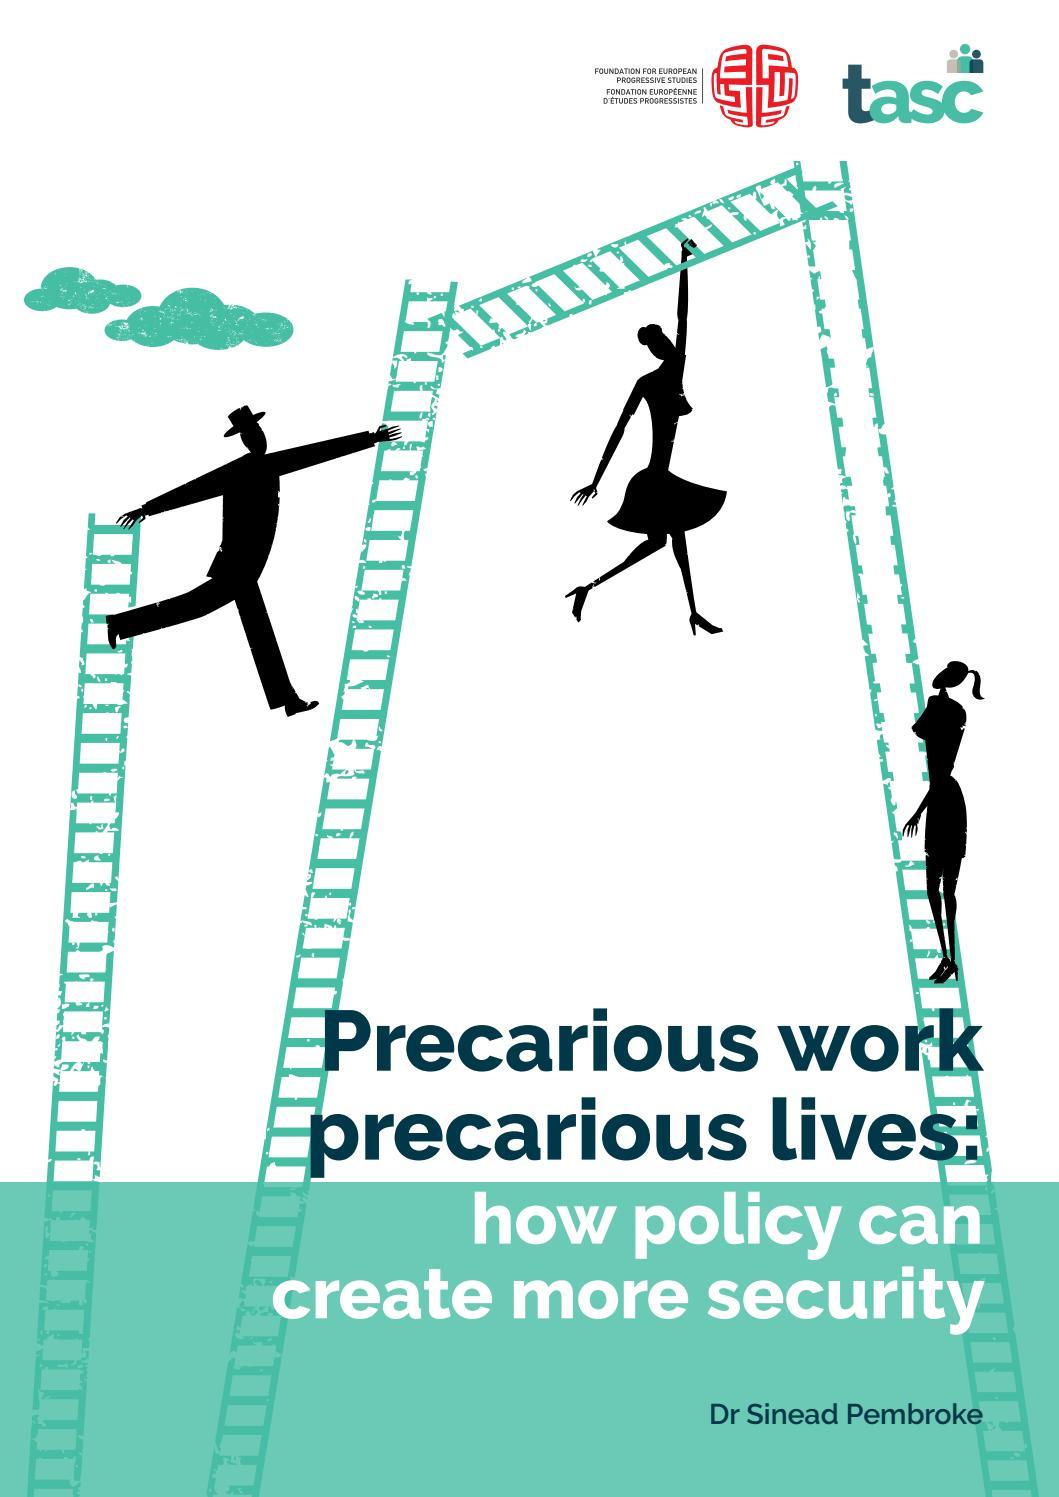 18454 precarious workersweb by TASC - issuu